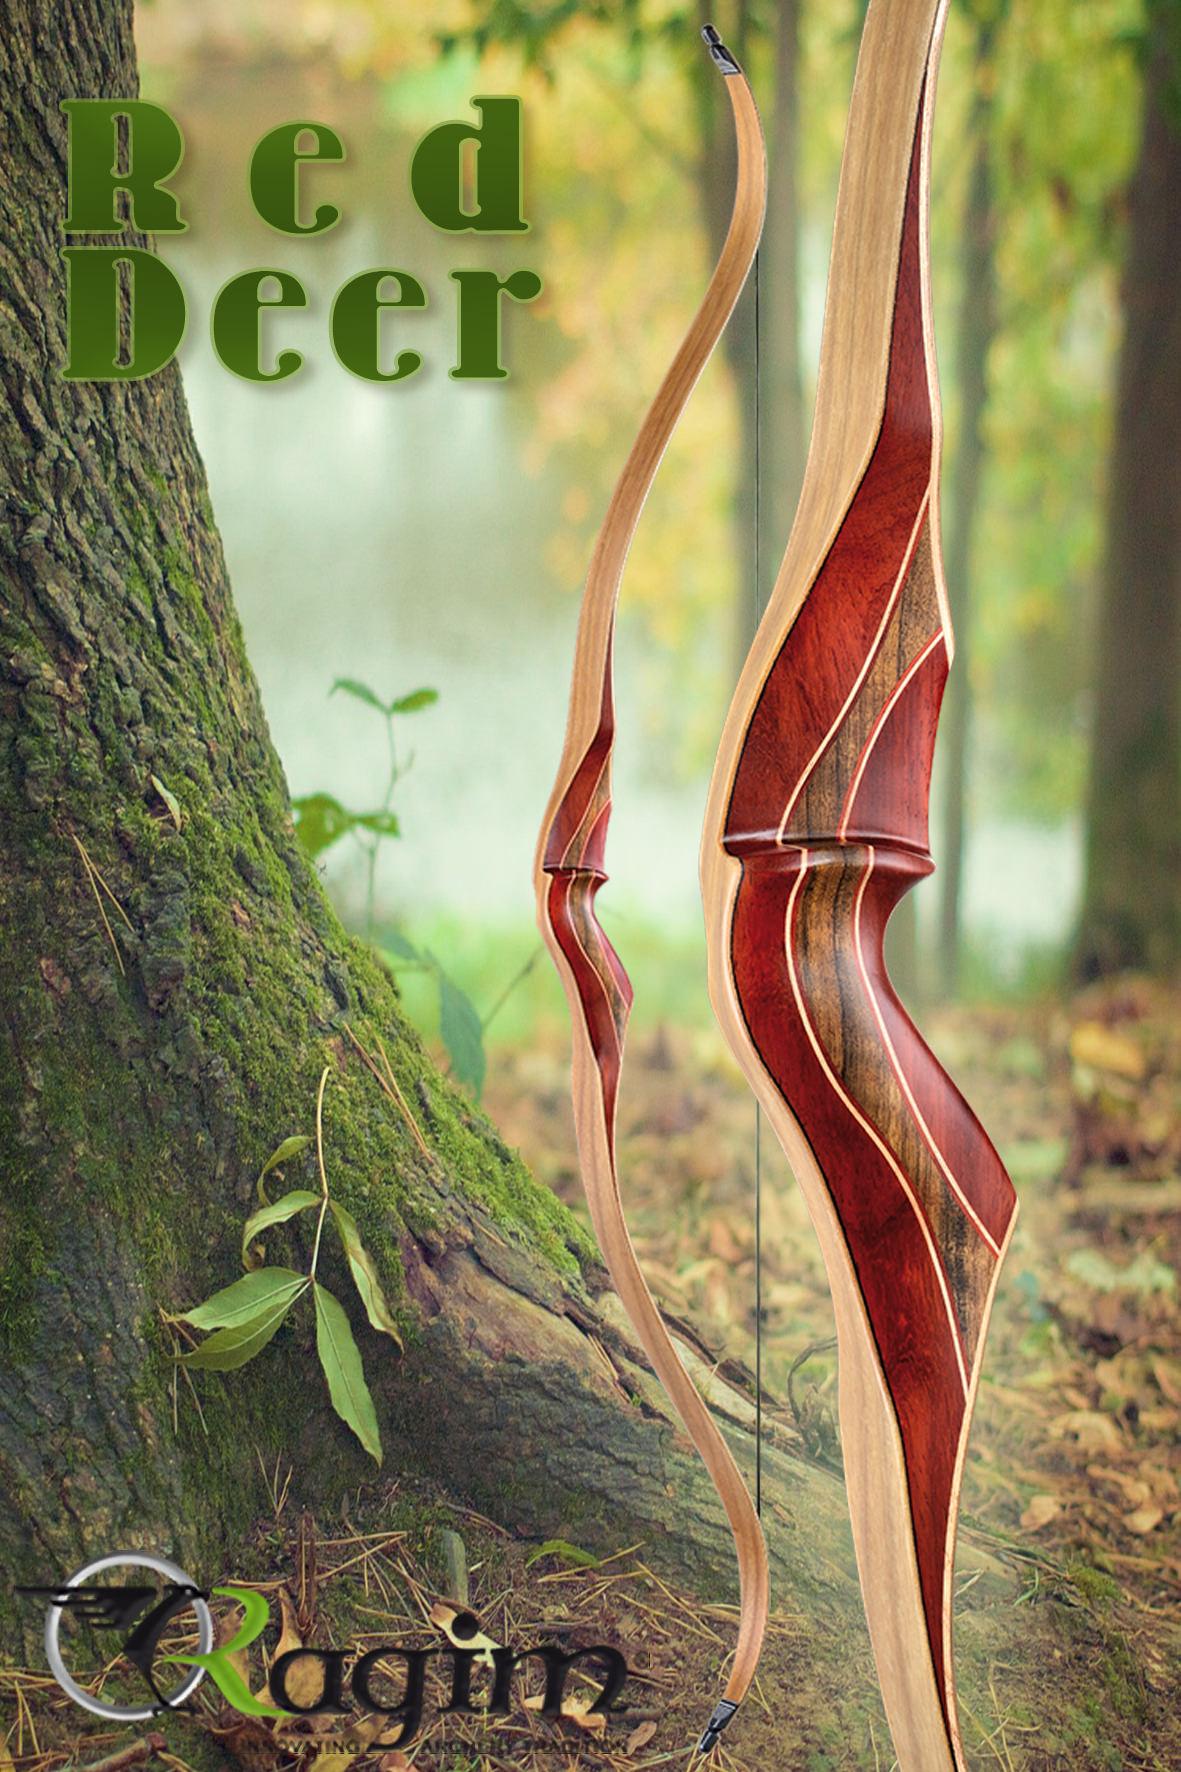 Red Deer 2016